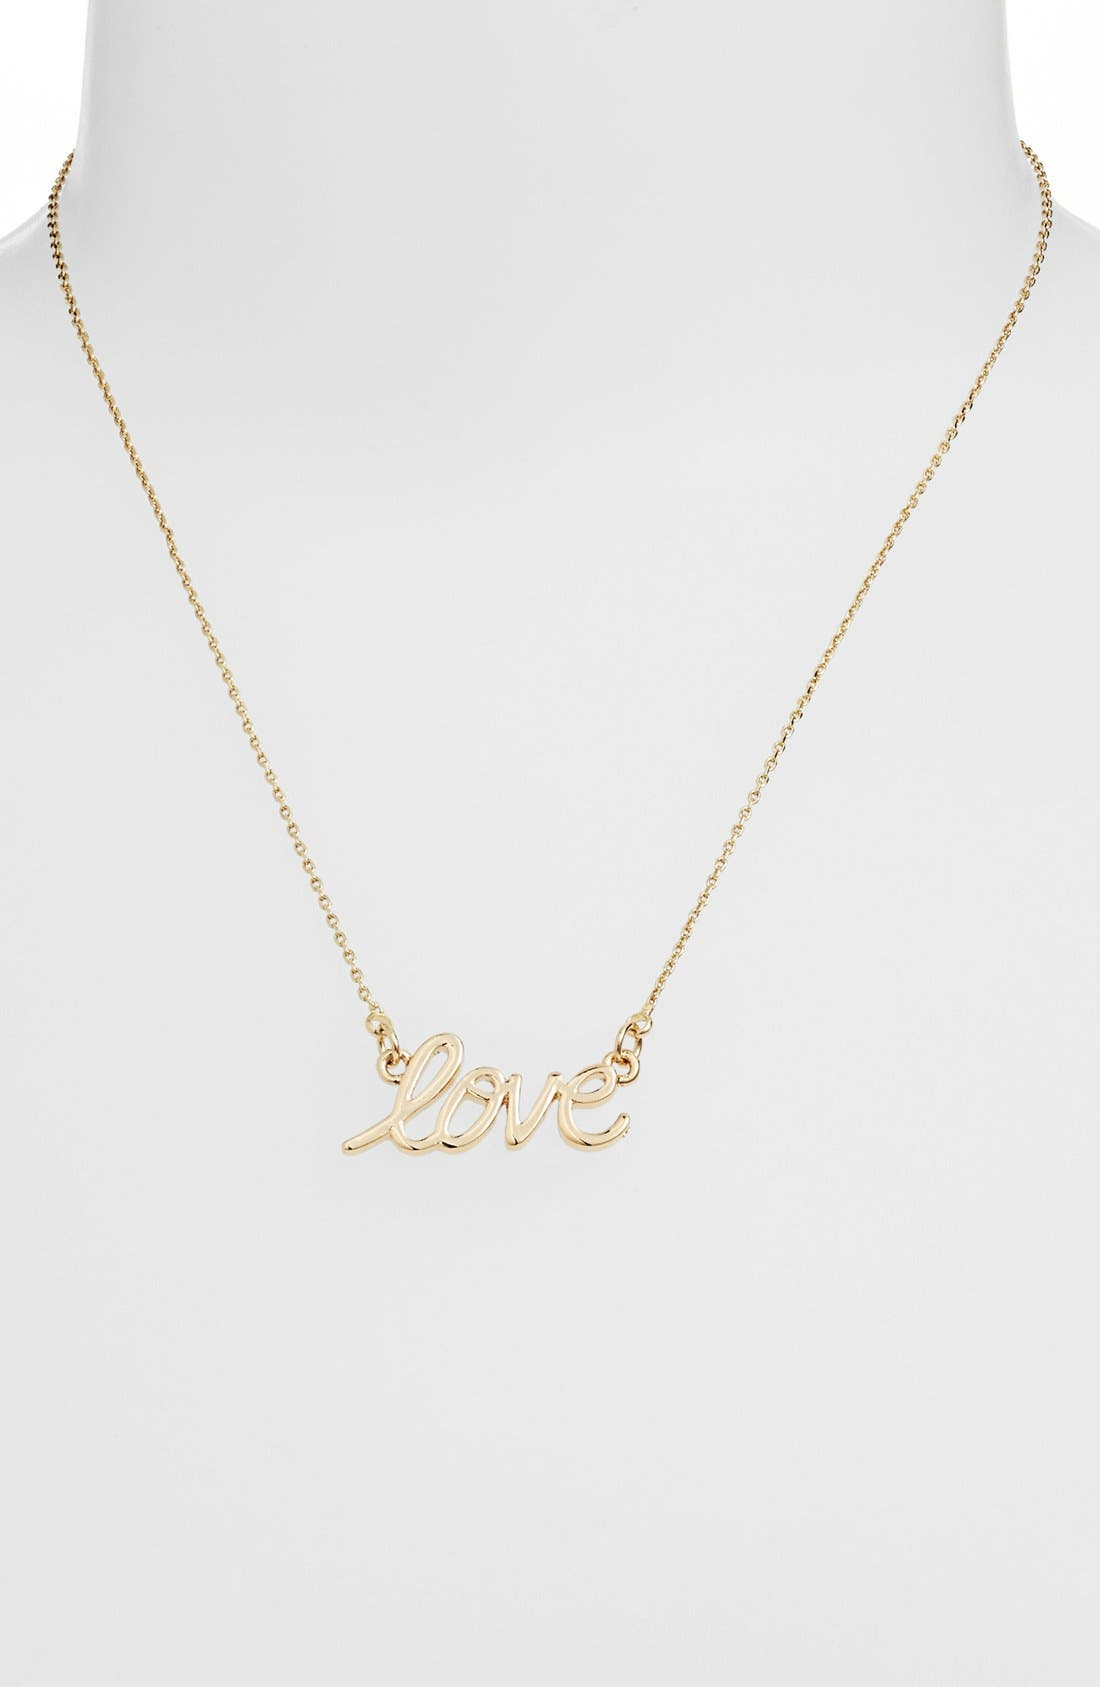 Alternate Image 1 Selected - Stephan & Co. 'Love' Script Necklace (Juniors)